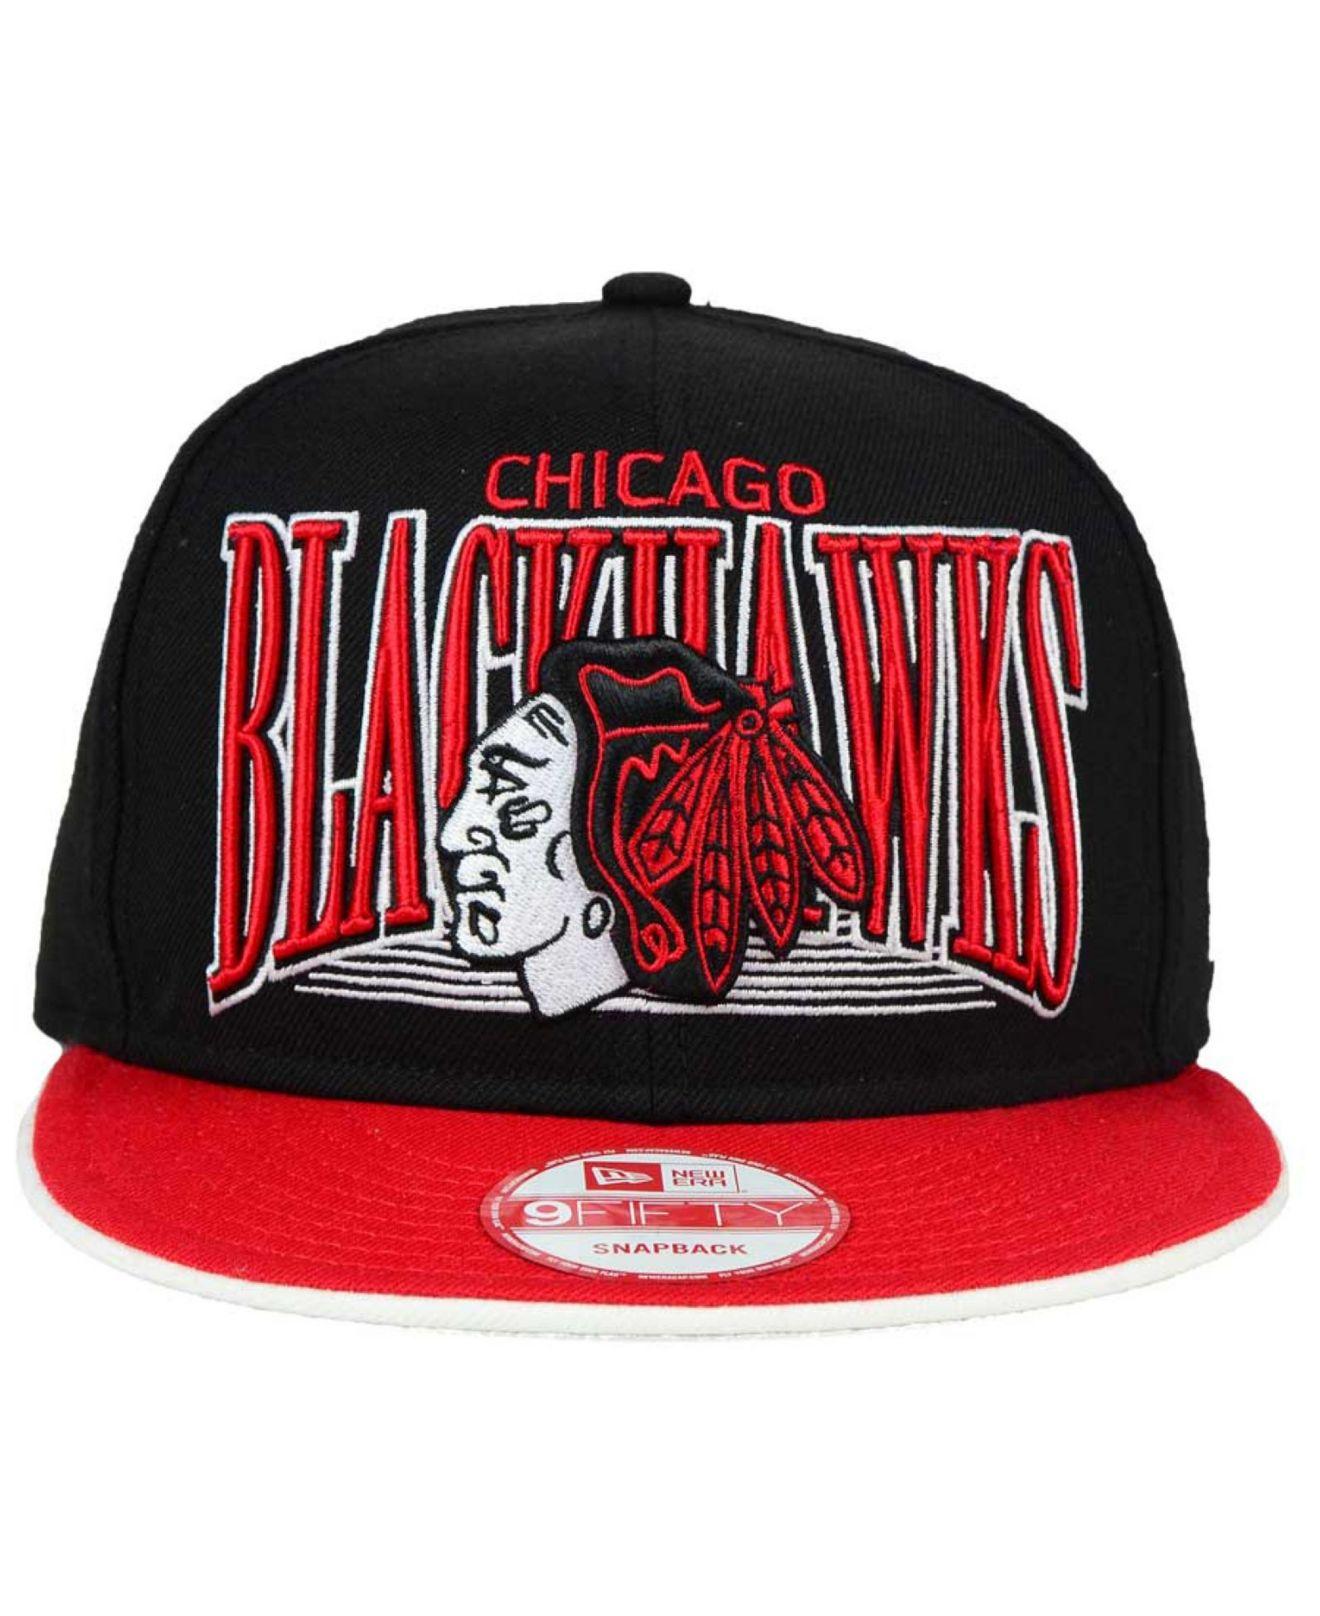 Lyst - KTZ Chicago Blackhawks Ice Block 9fifty Snapback Cap in Red ... 24369967fff5